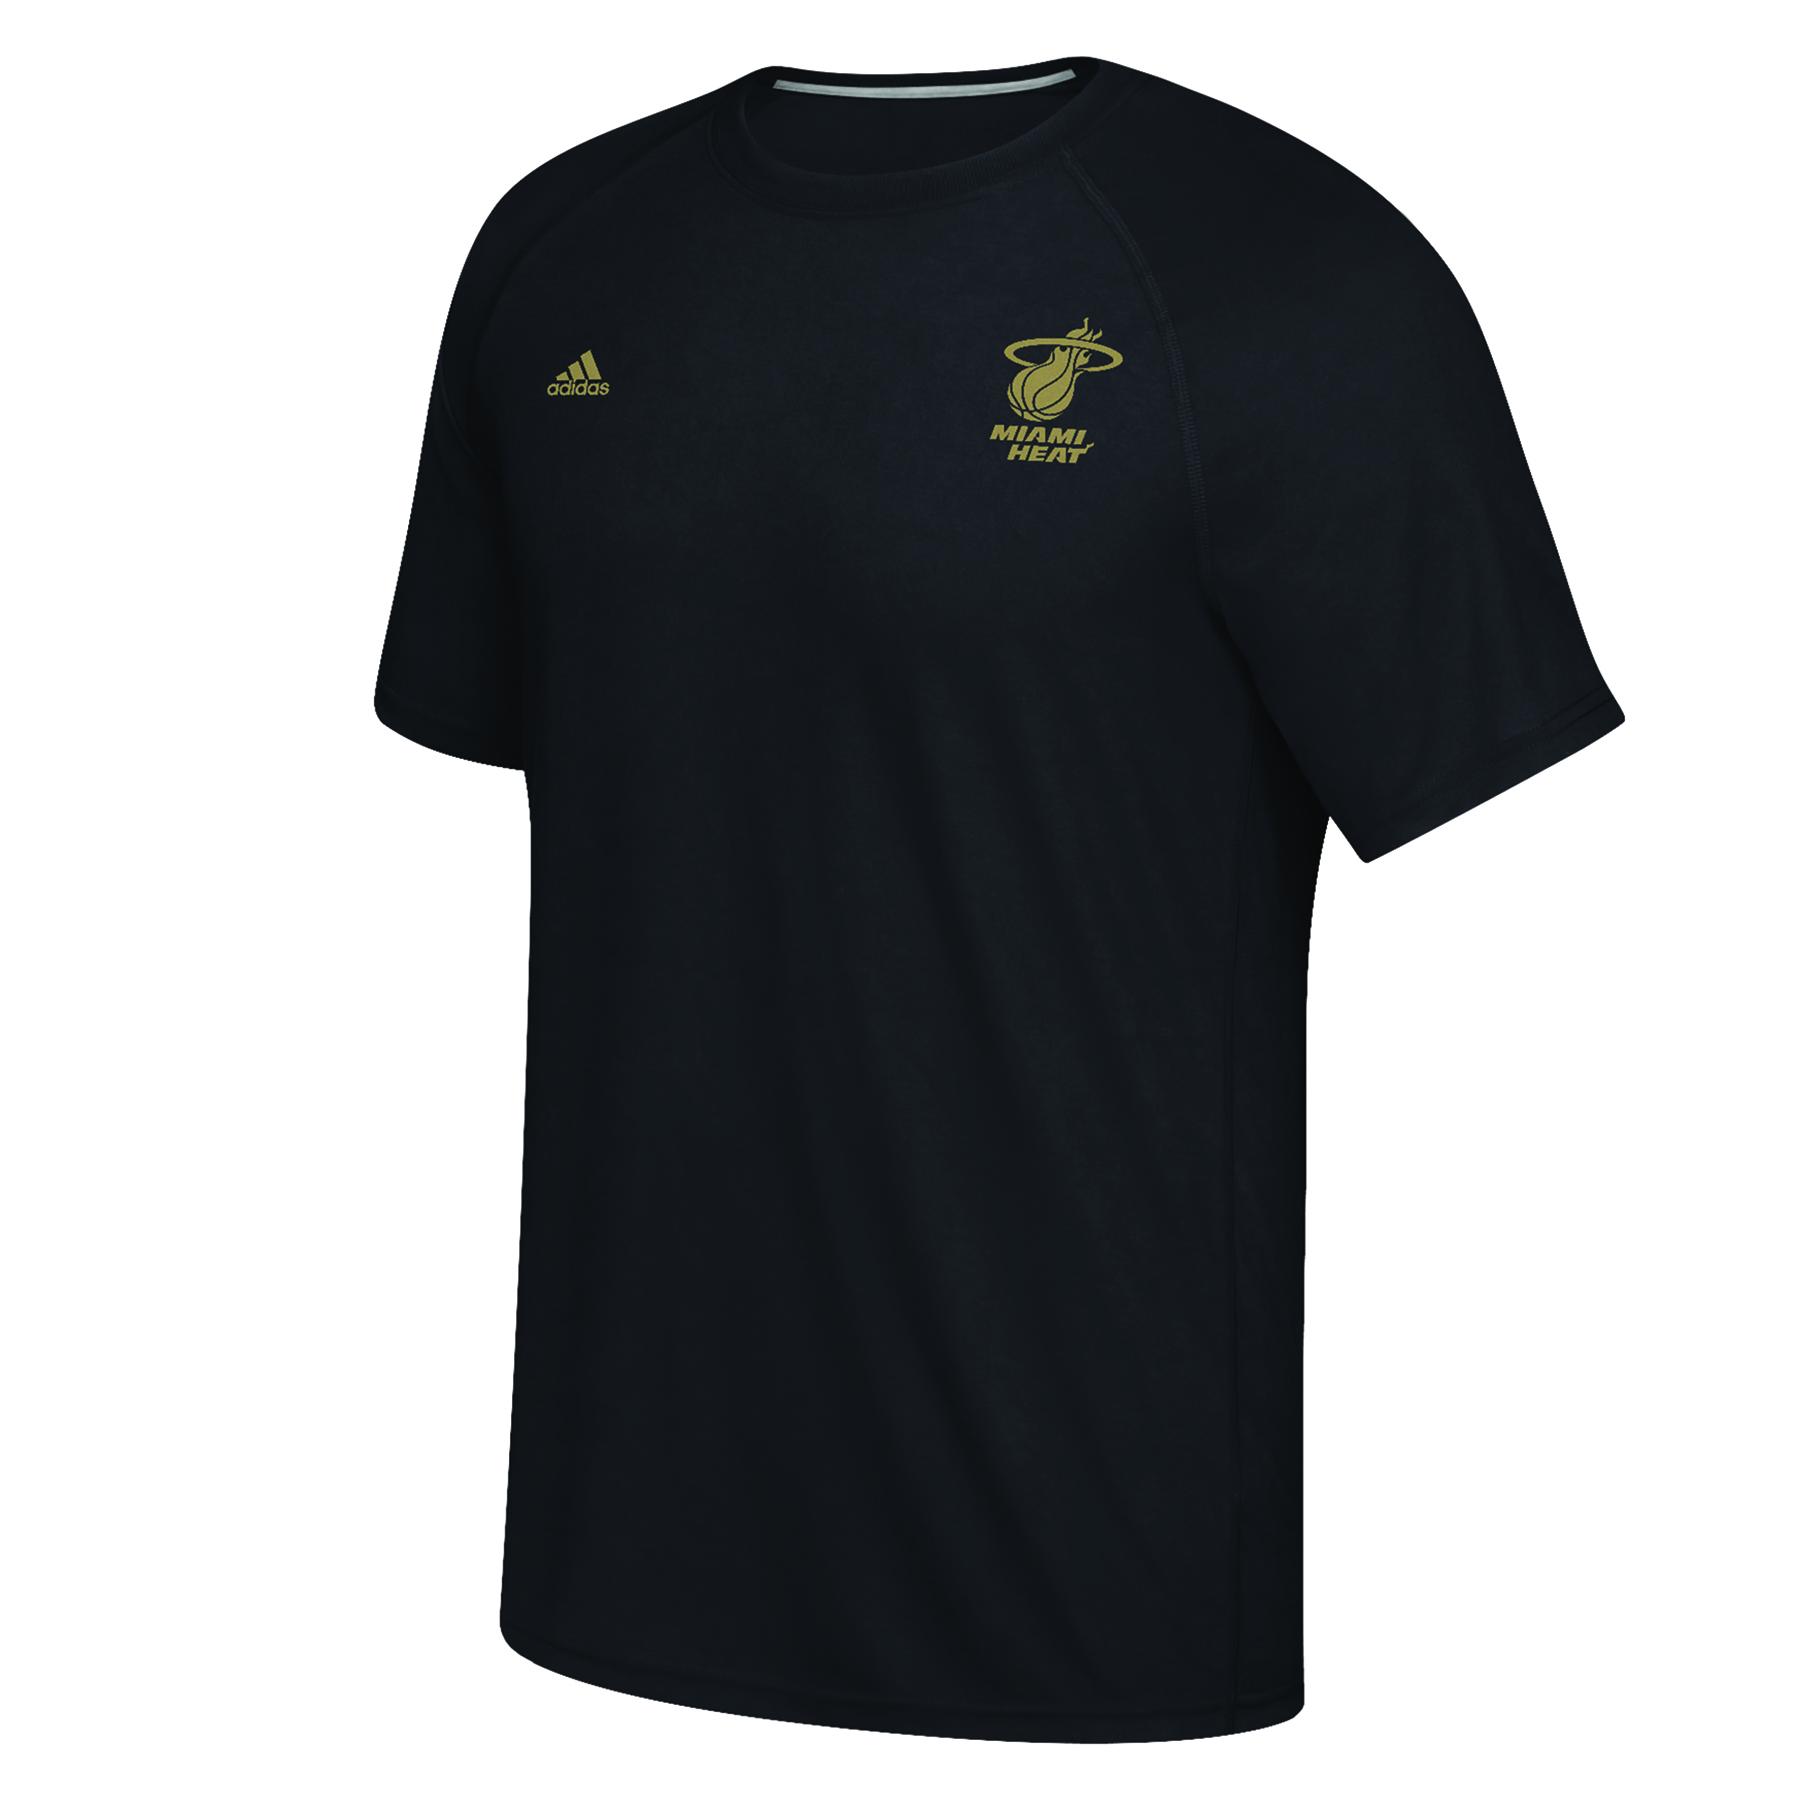 Miami Heat adidas Climalite Ultimate Short Sleeve T-Shirt